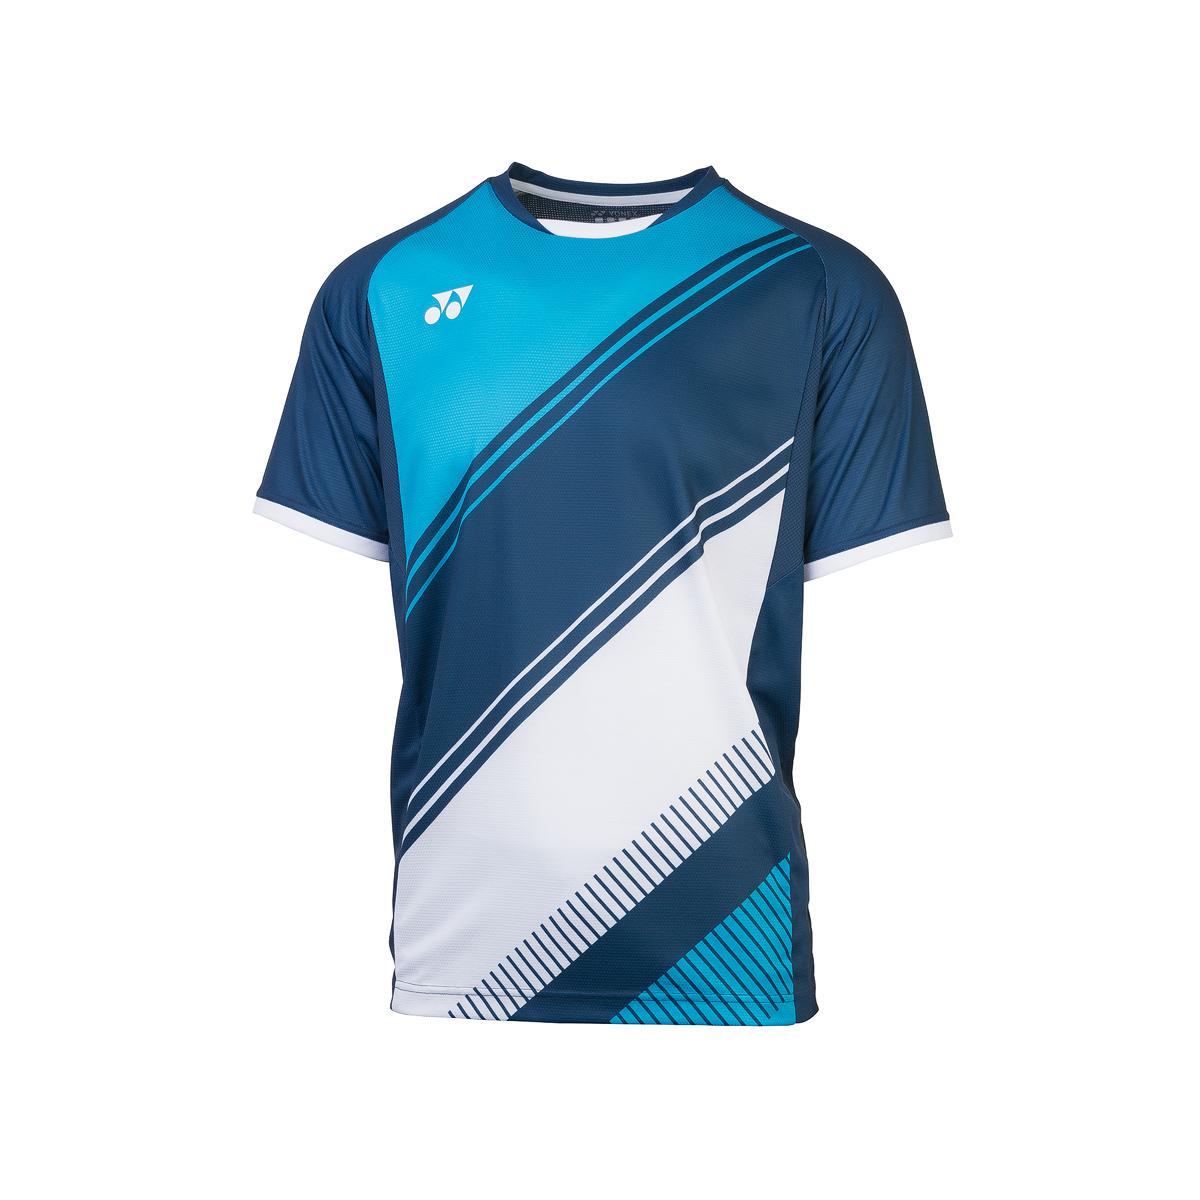 Men's Crew Neck Shirt Badminton TournamentDetailbild - 0